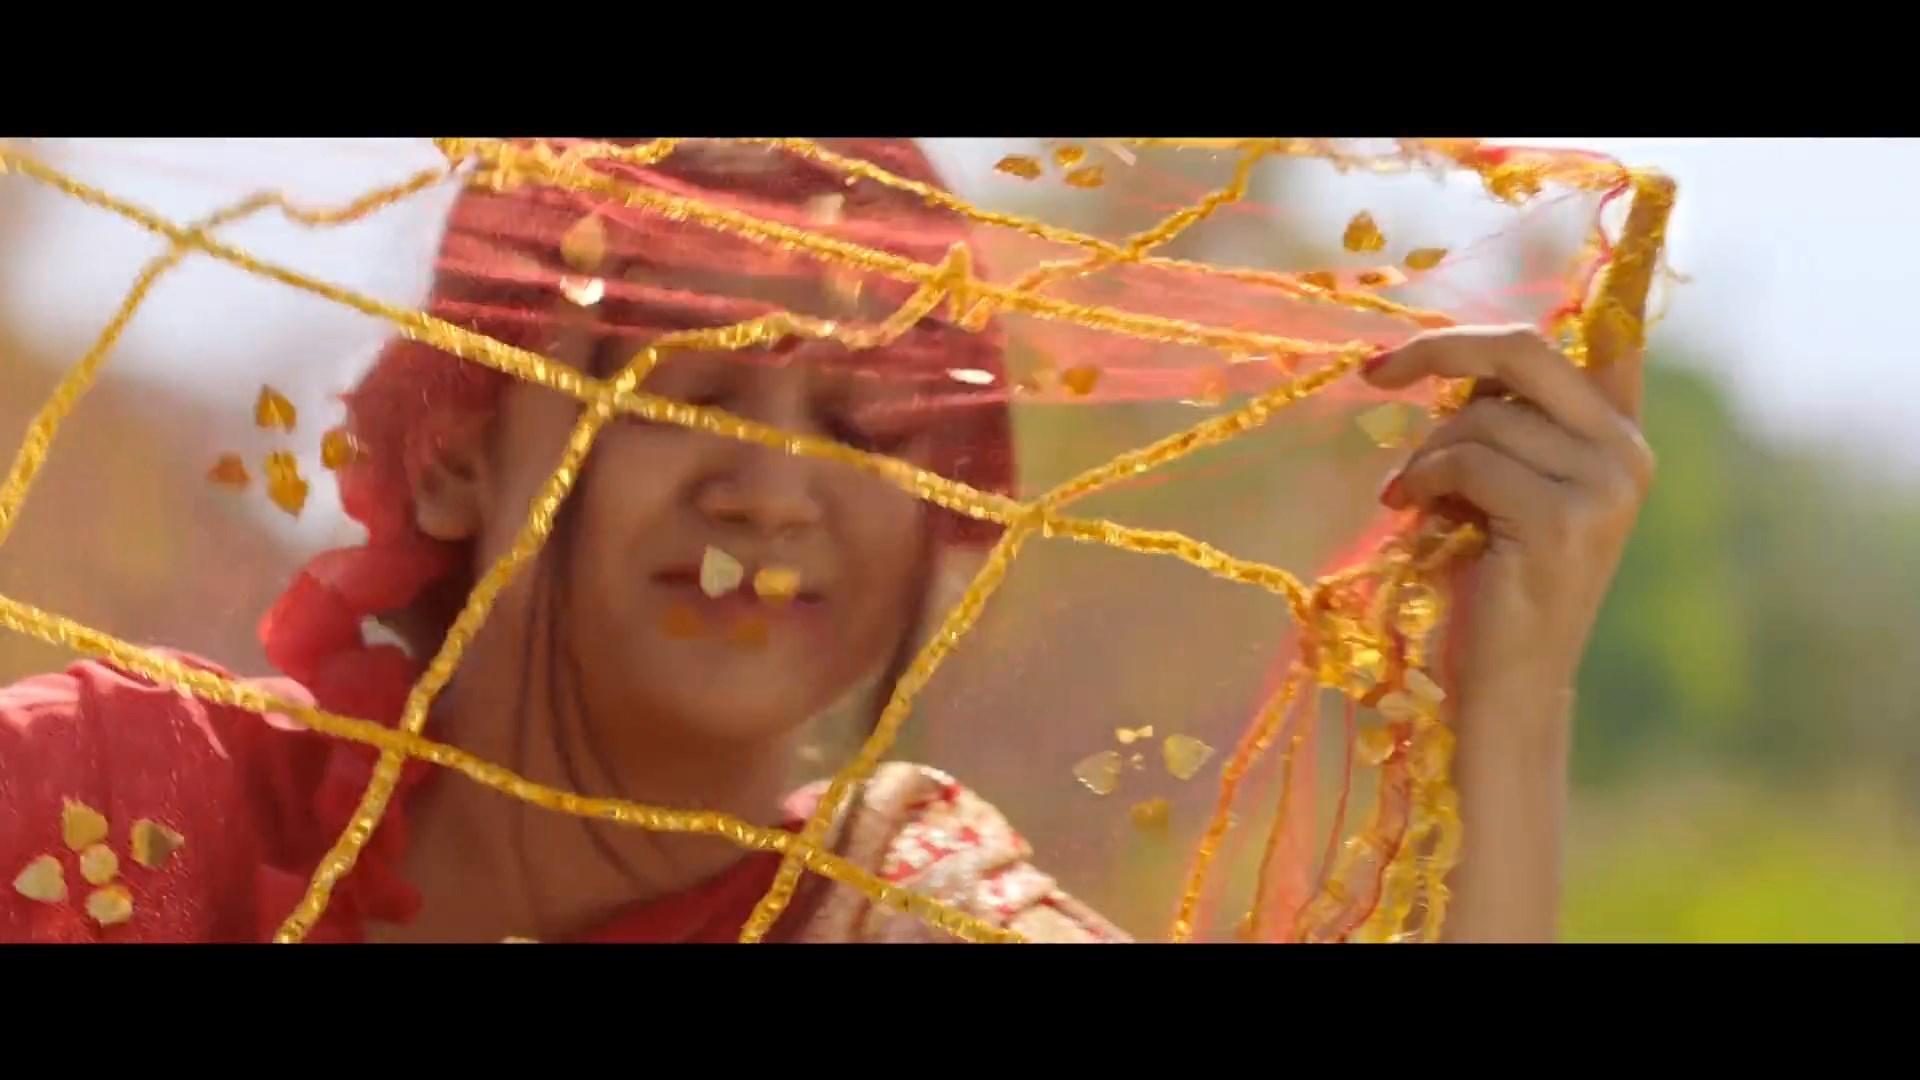 Uronchondi.2018.Bengali.1080p.WEB.DL.AVC.AAC.DUS.ICTV.mkv snapshot 00.08.32.758